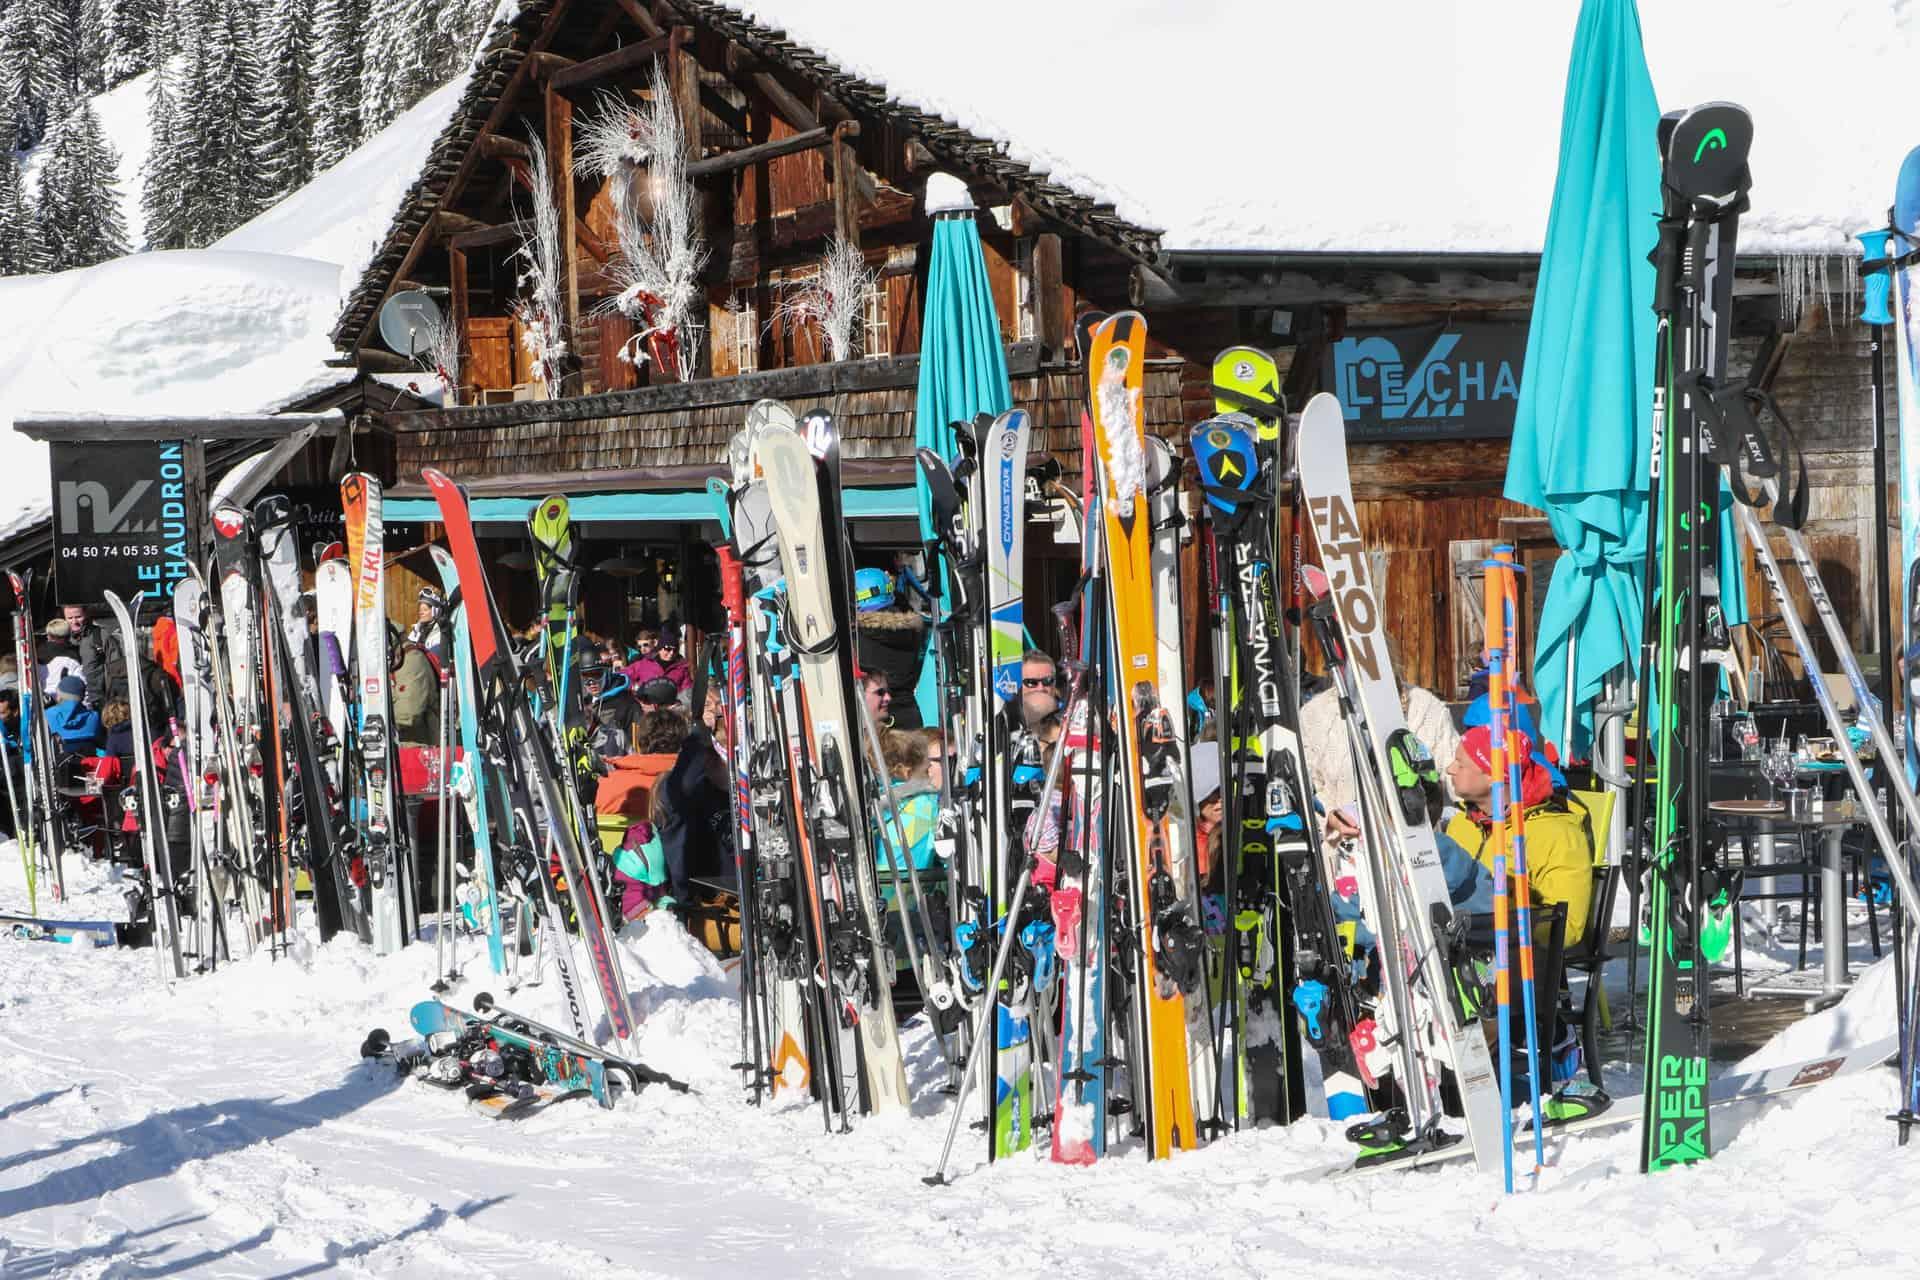 skis outside a mountain restaurant